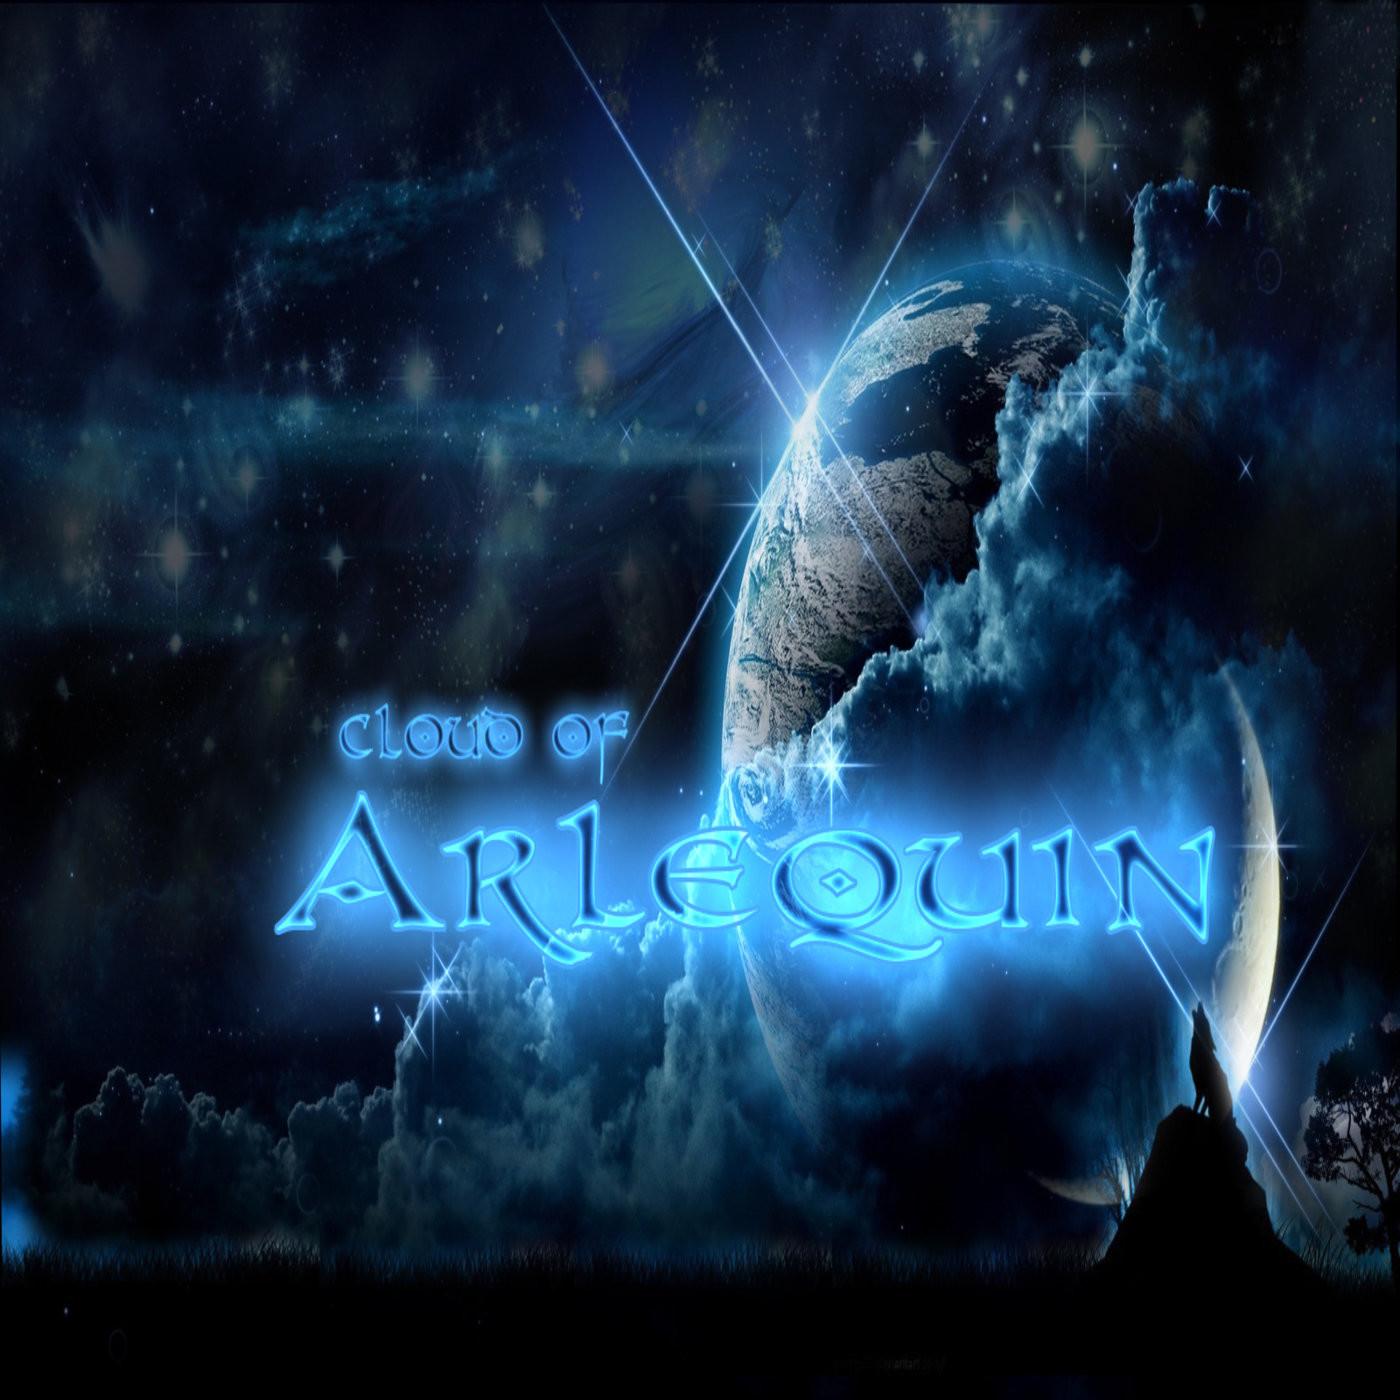 <![CDATA[ Cloud of Arlequin]]>